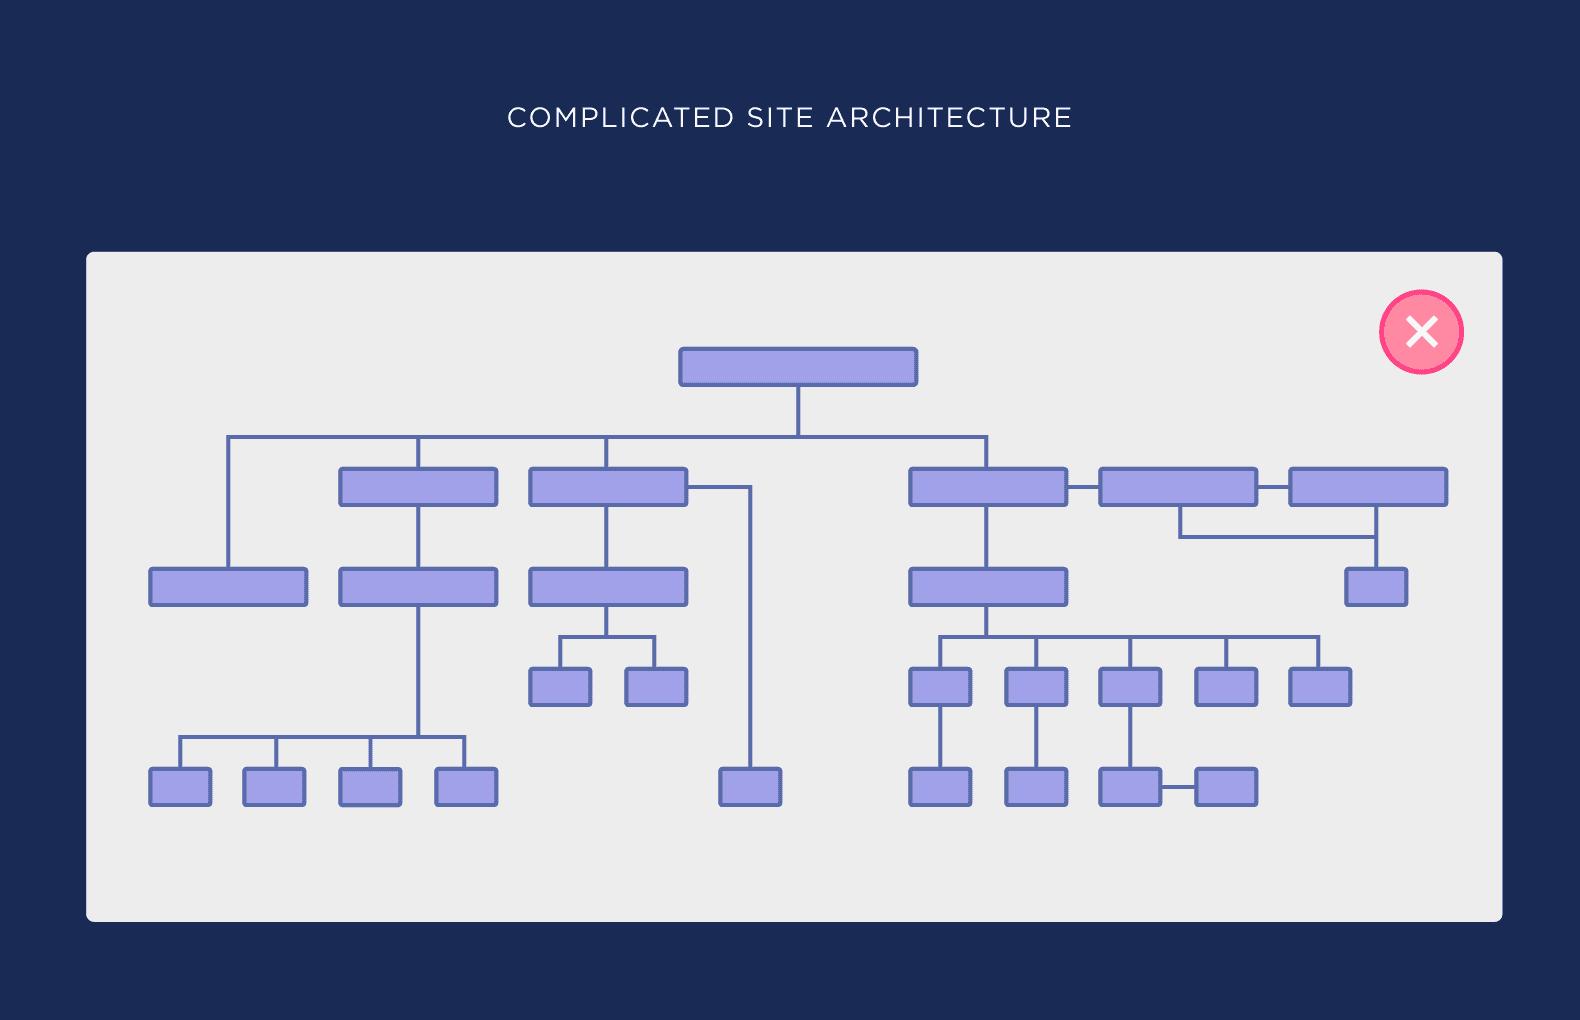 Complicated site architecture